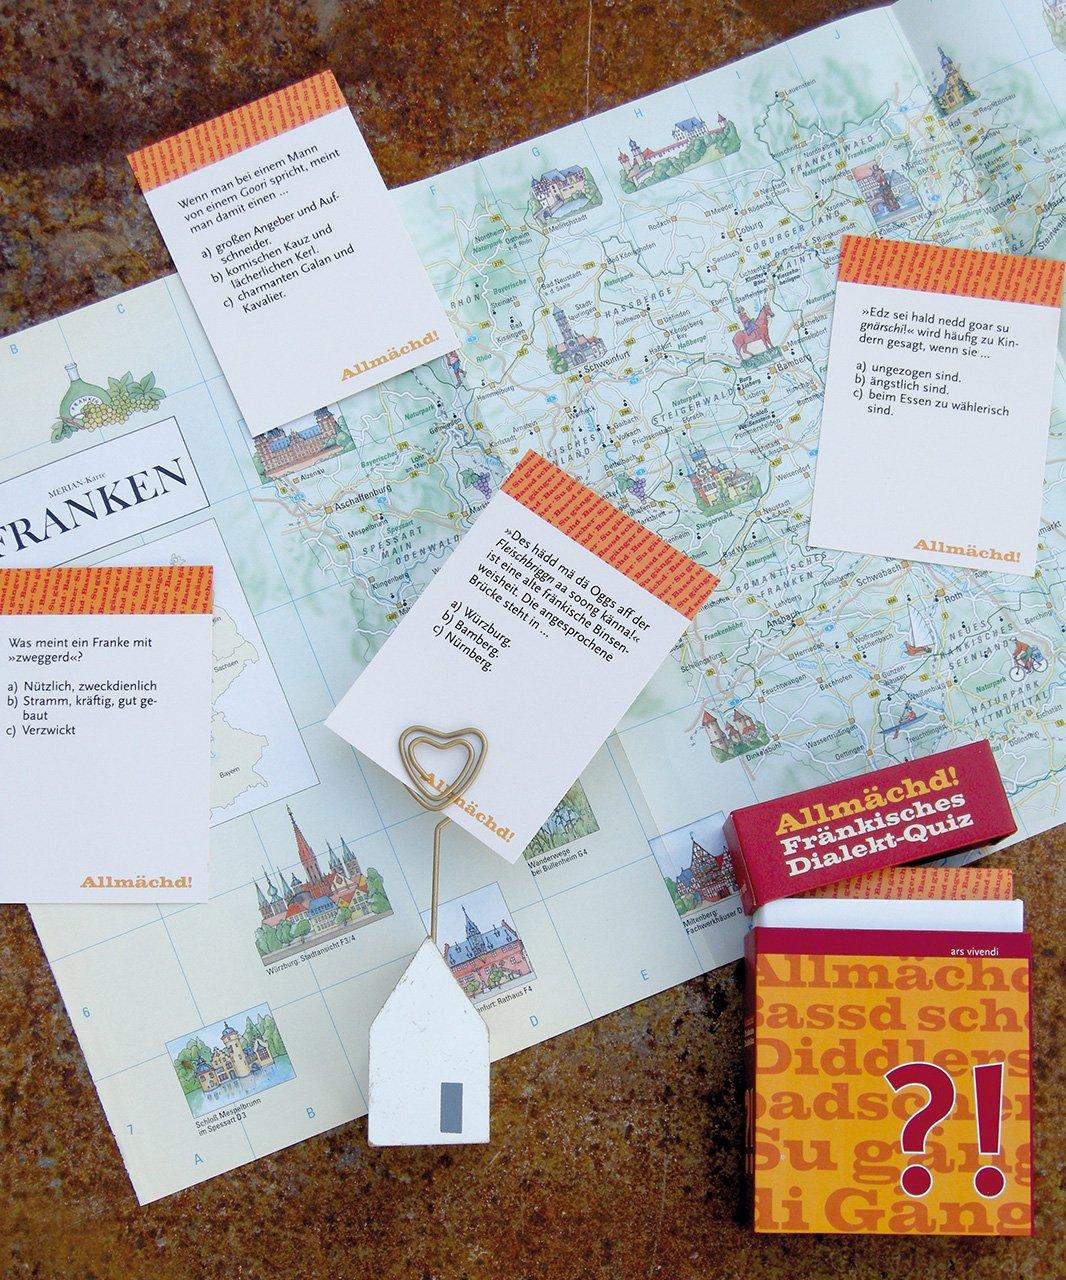 ars-vivendi-4250364113243-Allmchd-Frnkische-Dialekt-Quiz